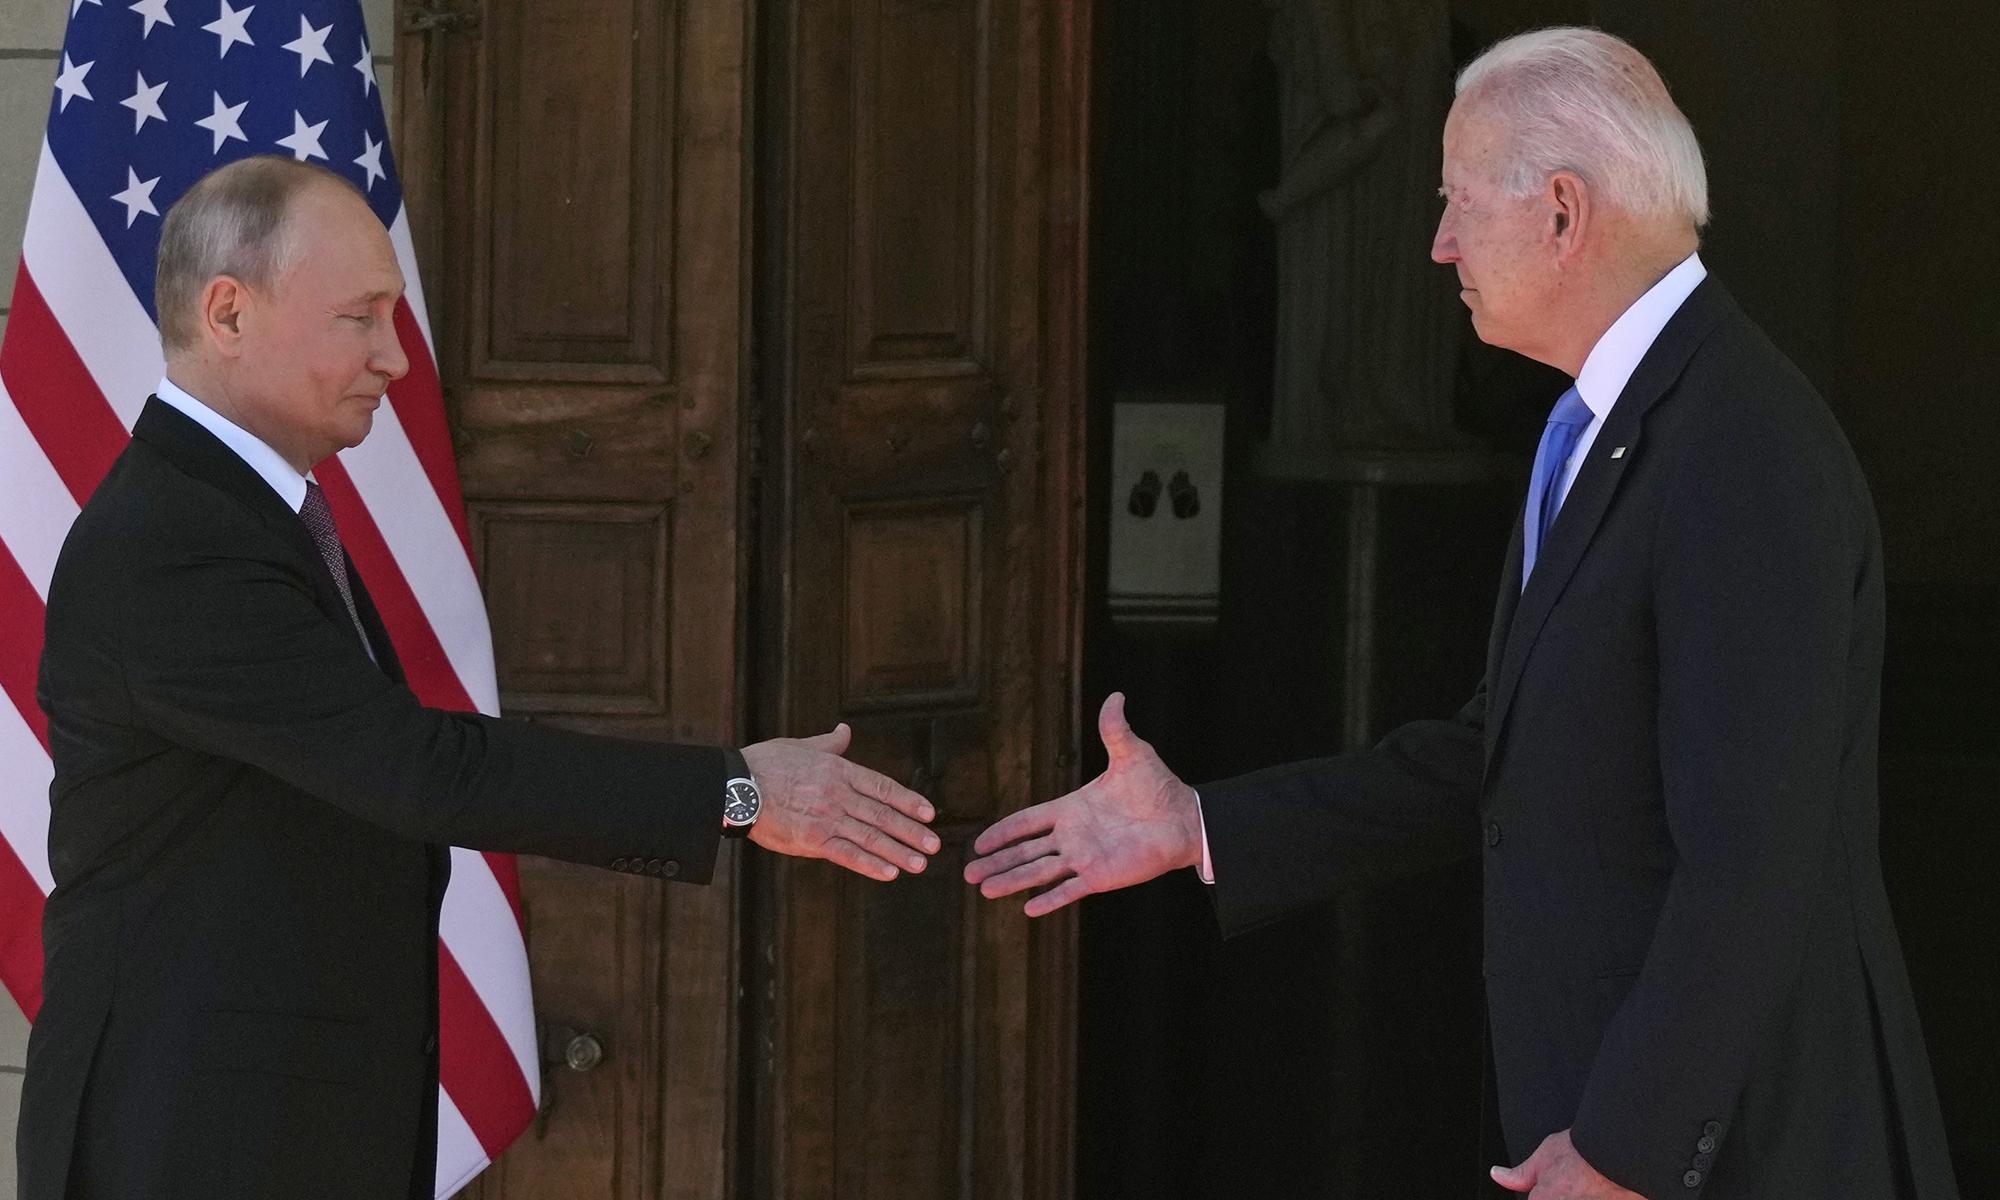 US President Joe Biden and Russian President Vladimir Putin arrive to meet at the Villa la Grange on Wednesday in Geneva, Switzerland. Photo: AP